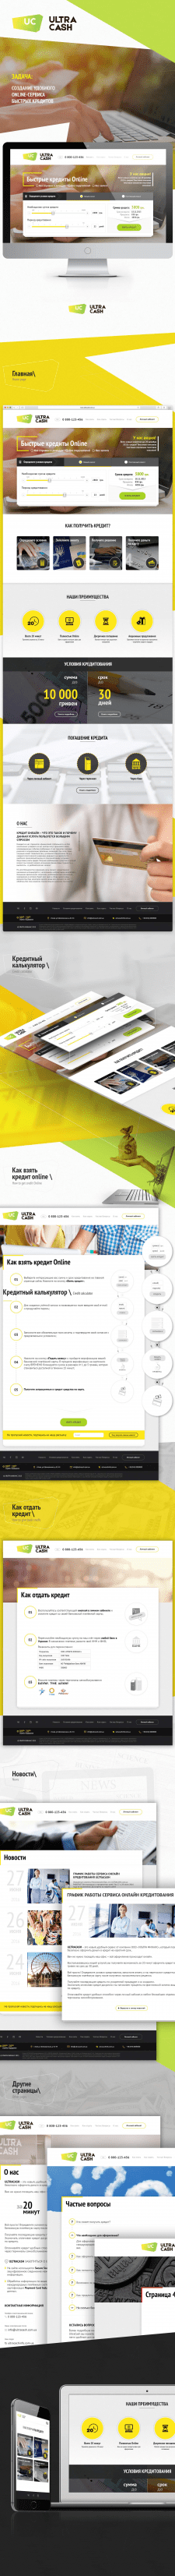 Веб-сервис UltraCash